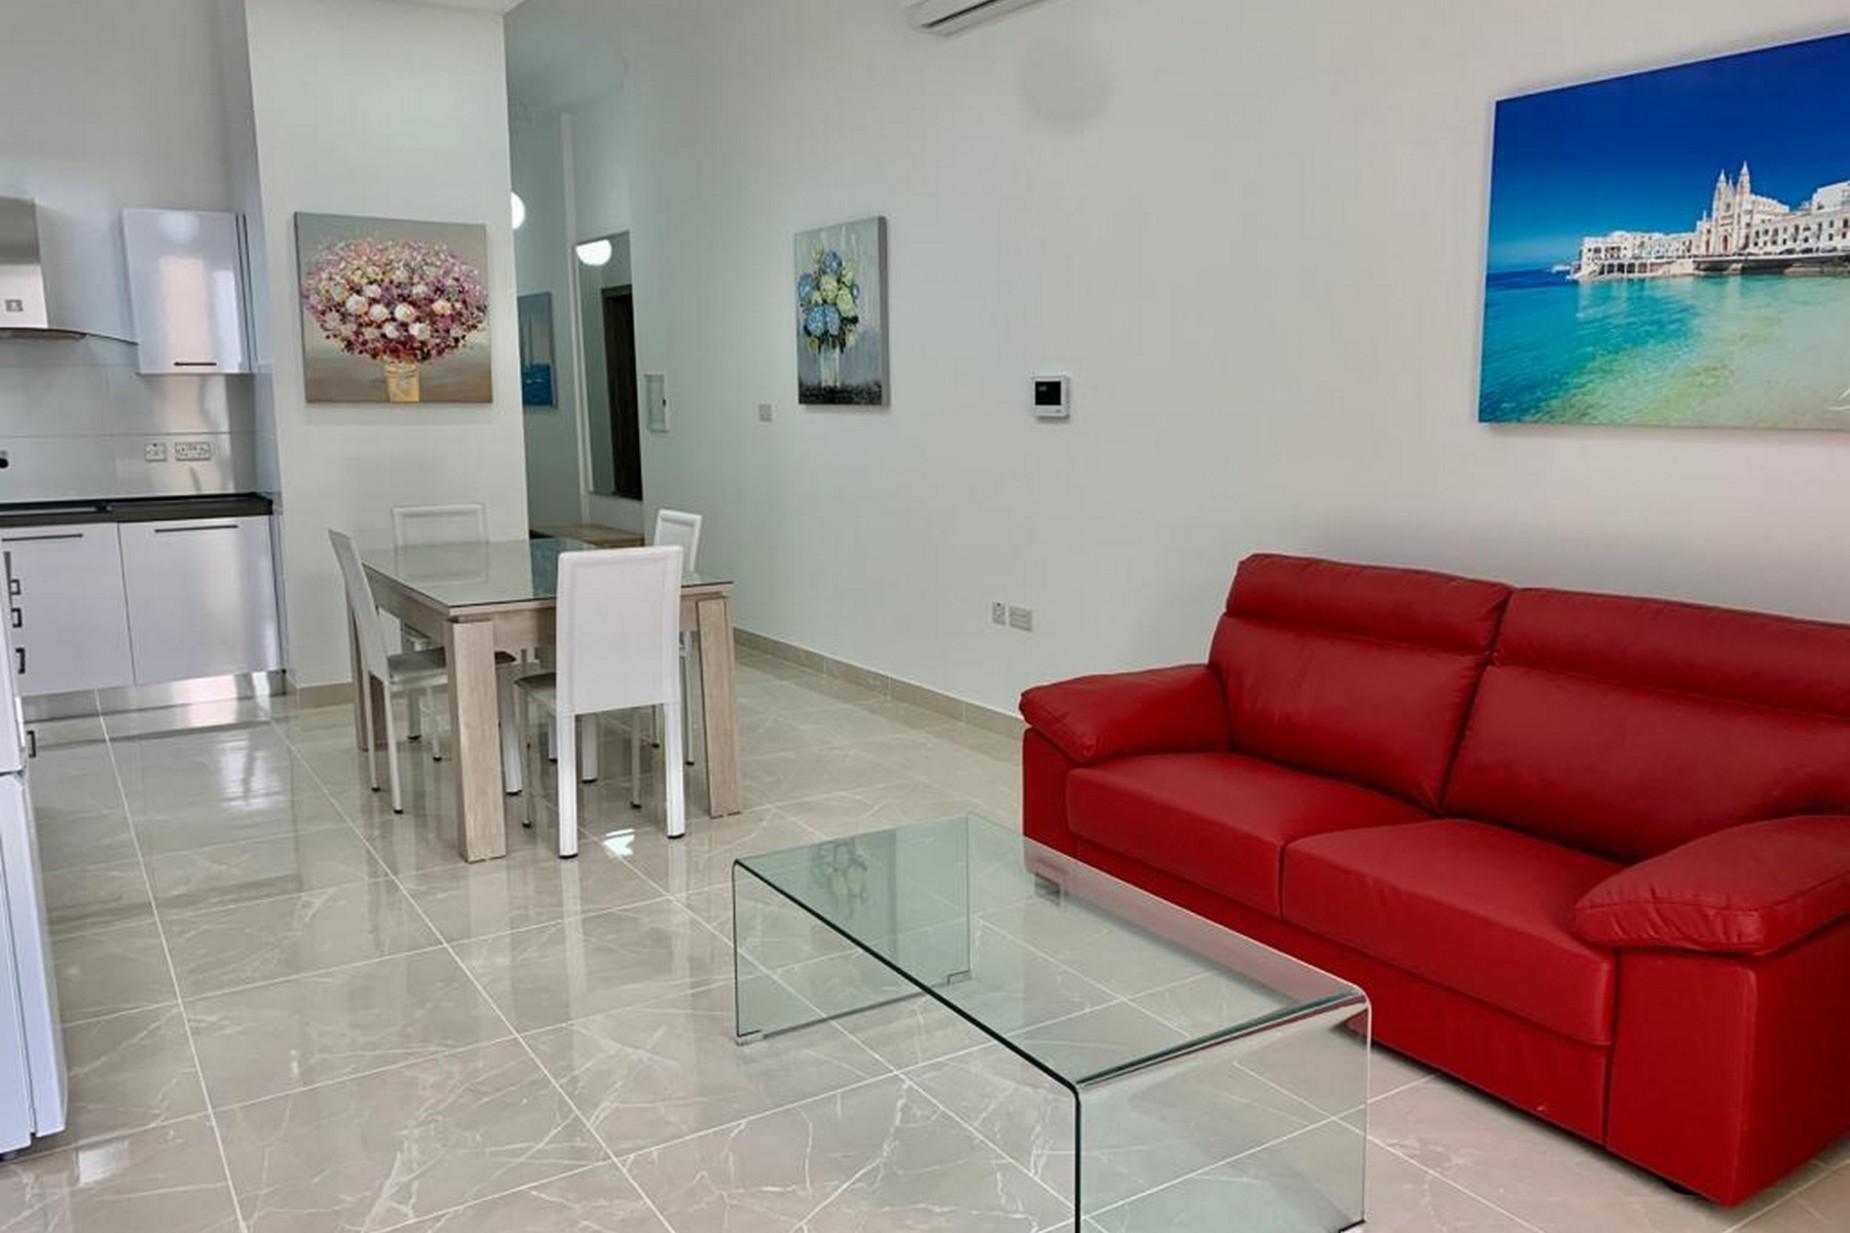 3 bed Apartment For Rent in Sliema, Sliema - thumb 2